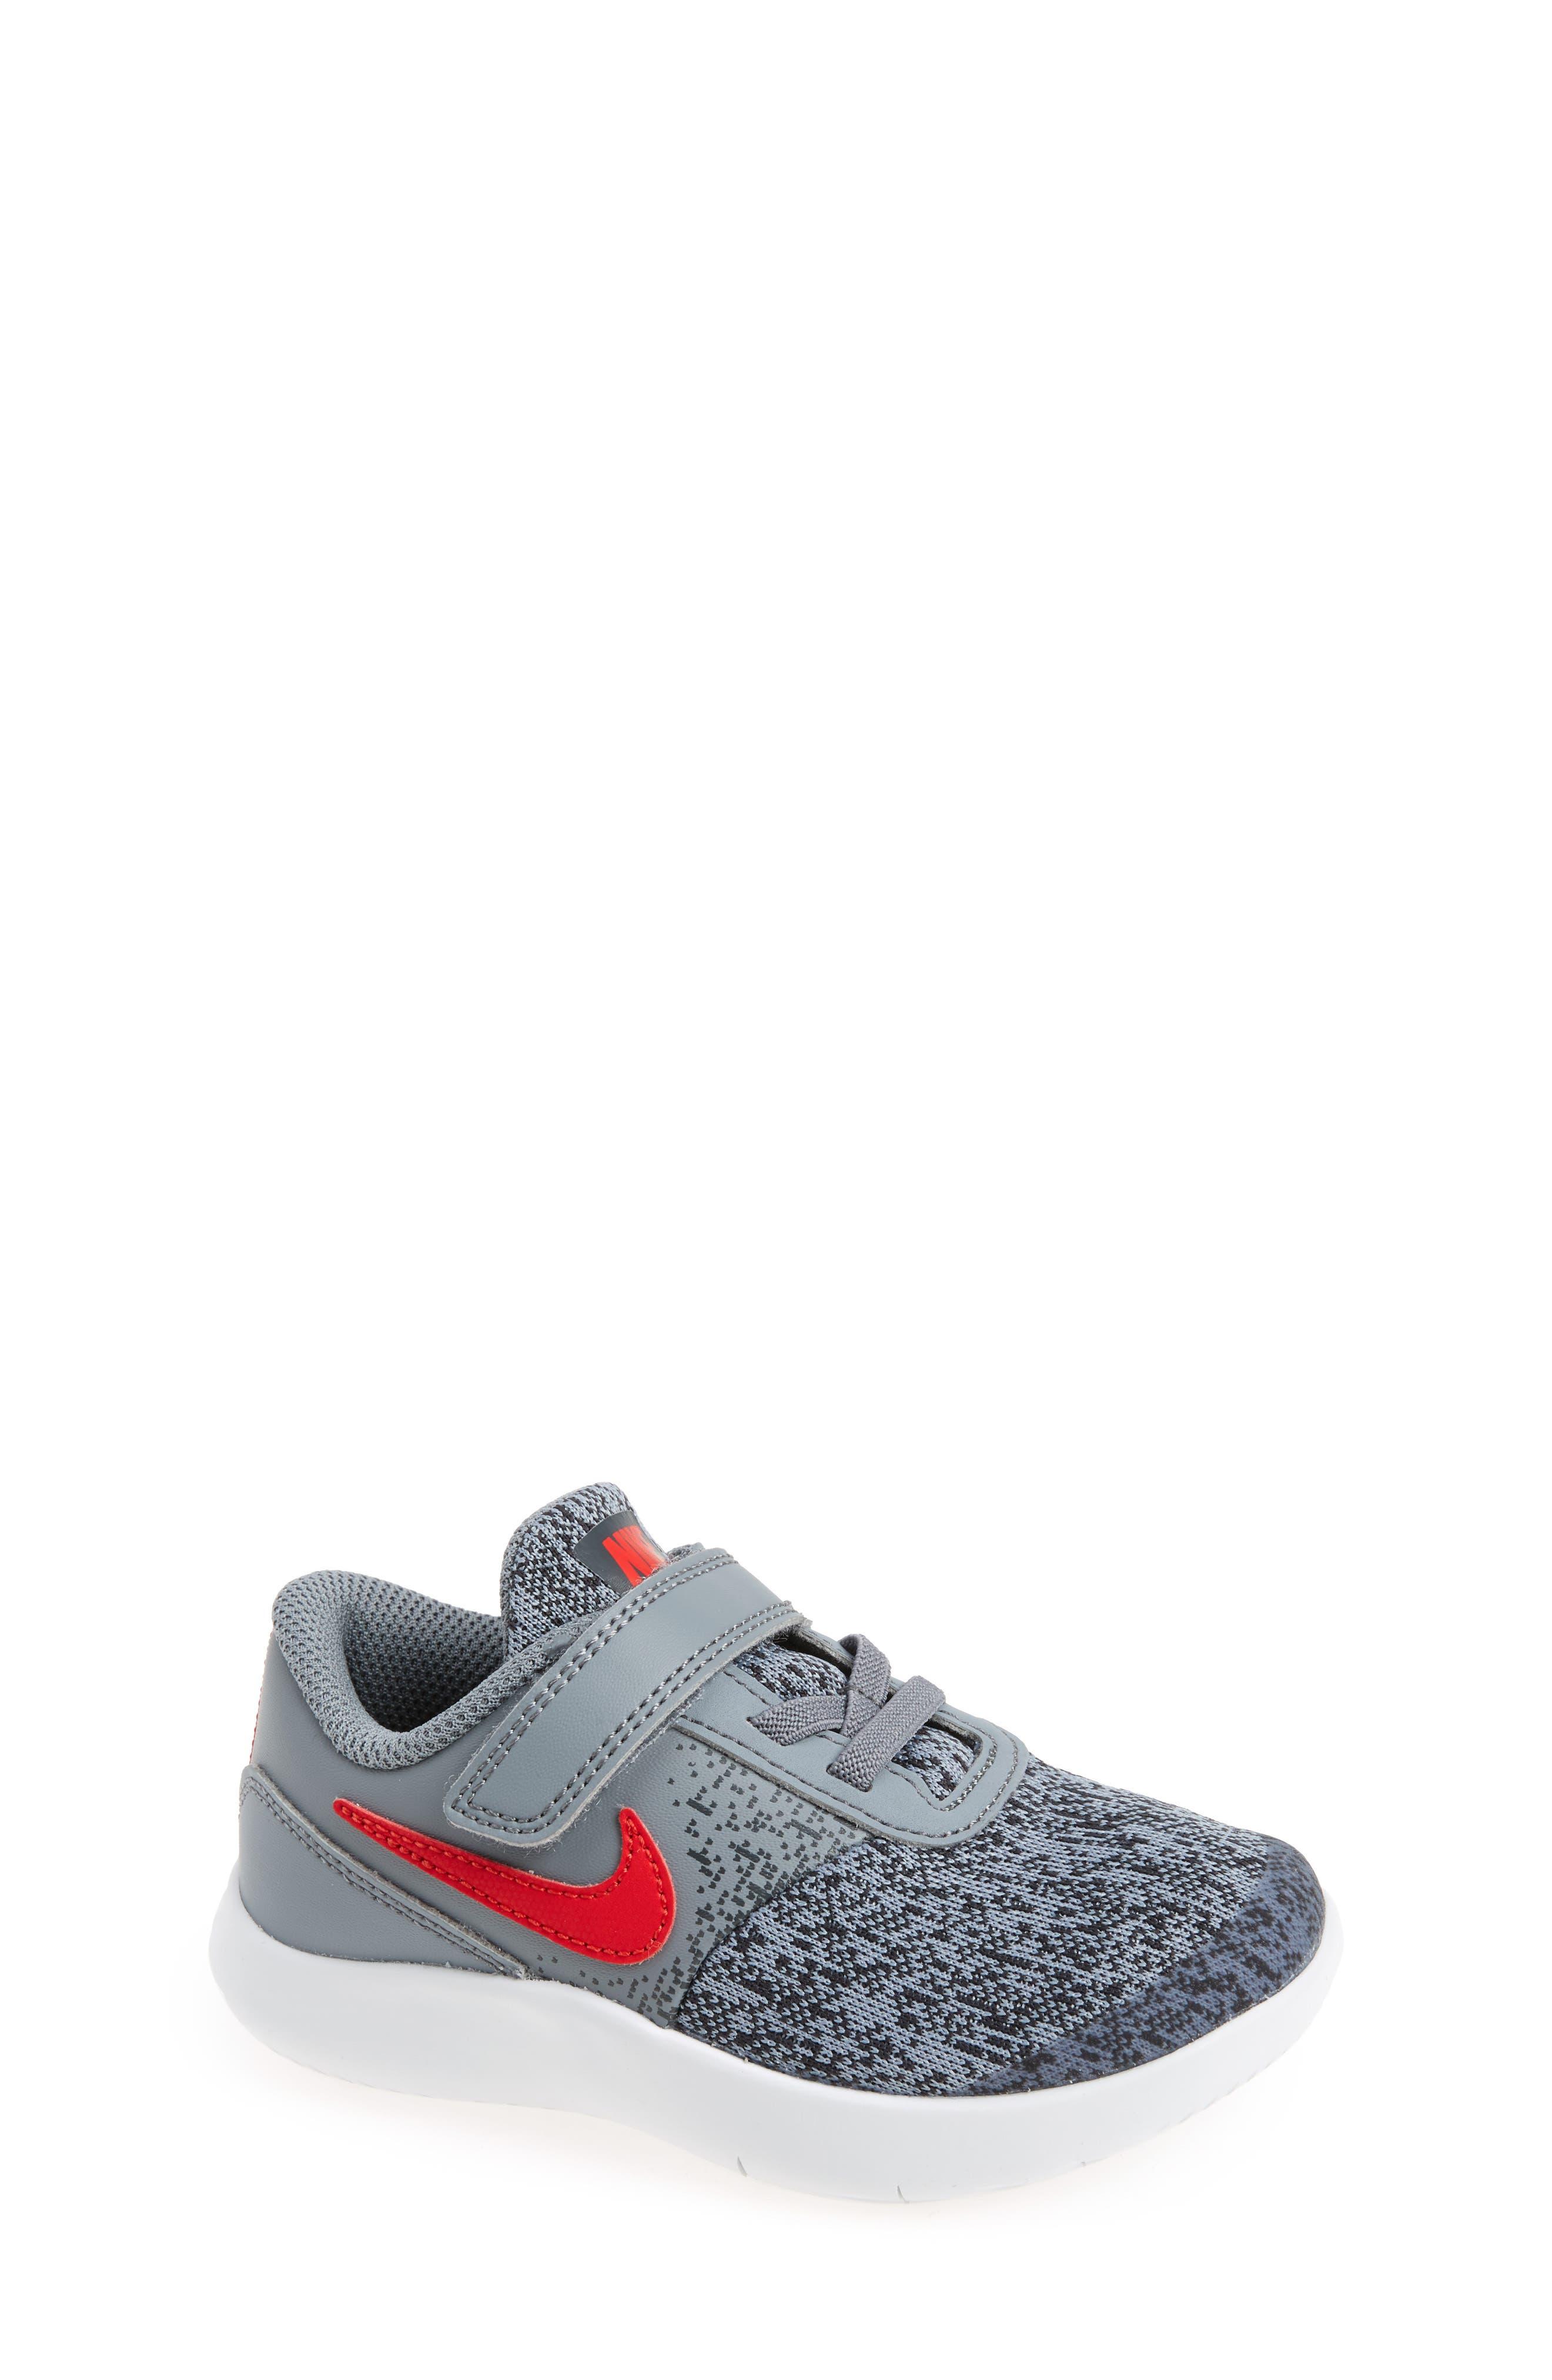 Alternate Image 1 Selected - Nike Flex Contact Sneaker (Baby, Walker & Toddler) (Regular Retail Price: $43.00)